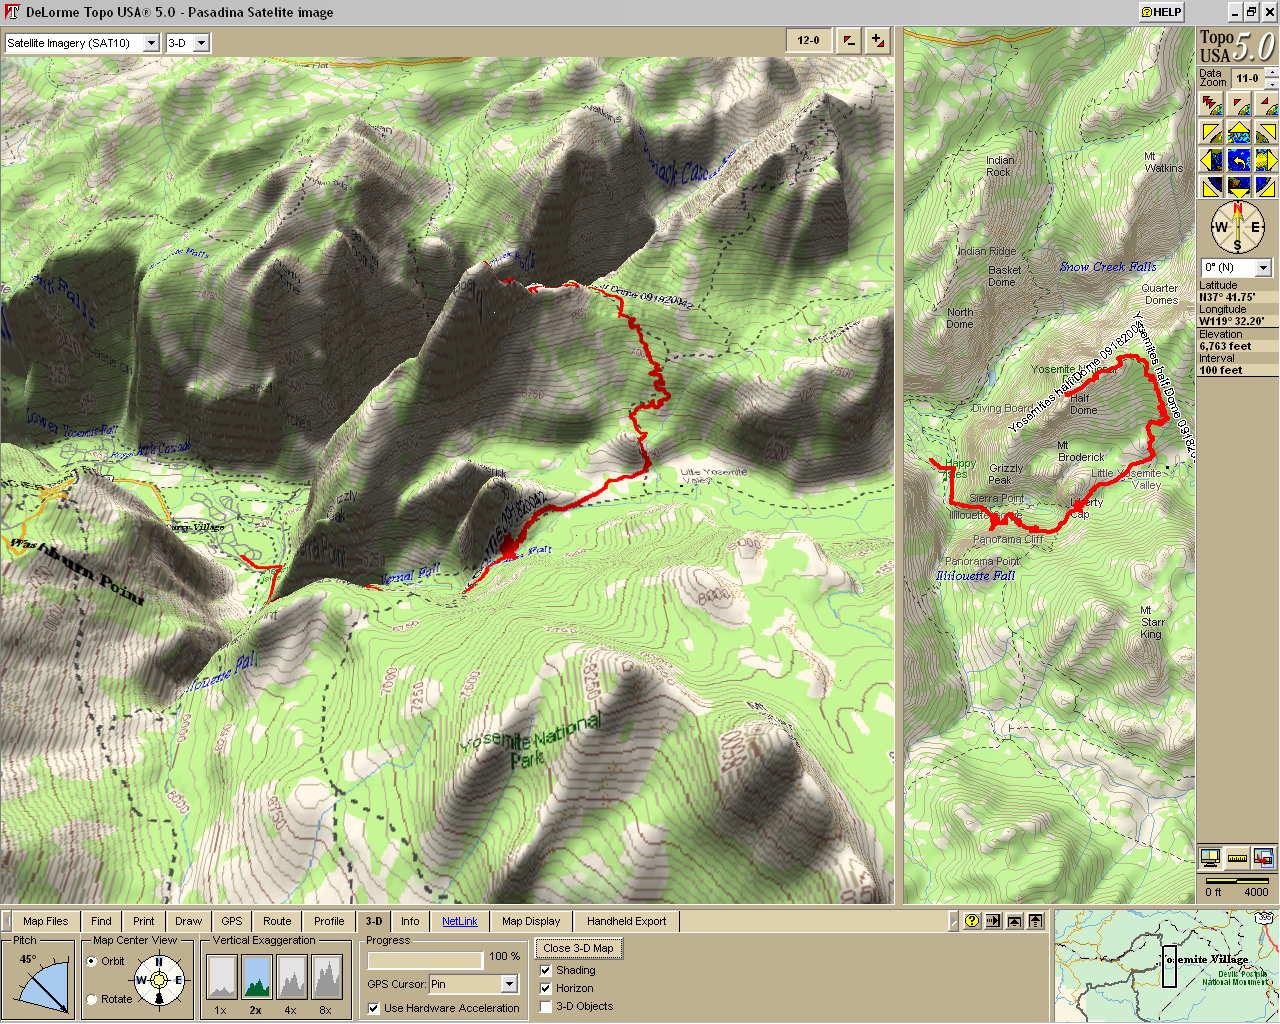 Yosemites_Half_Dome_09182004_topo_3D.jpg